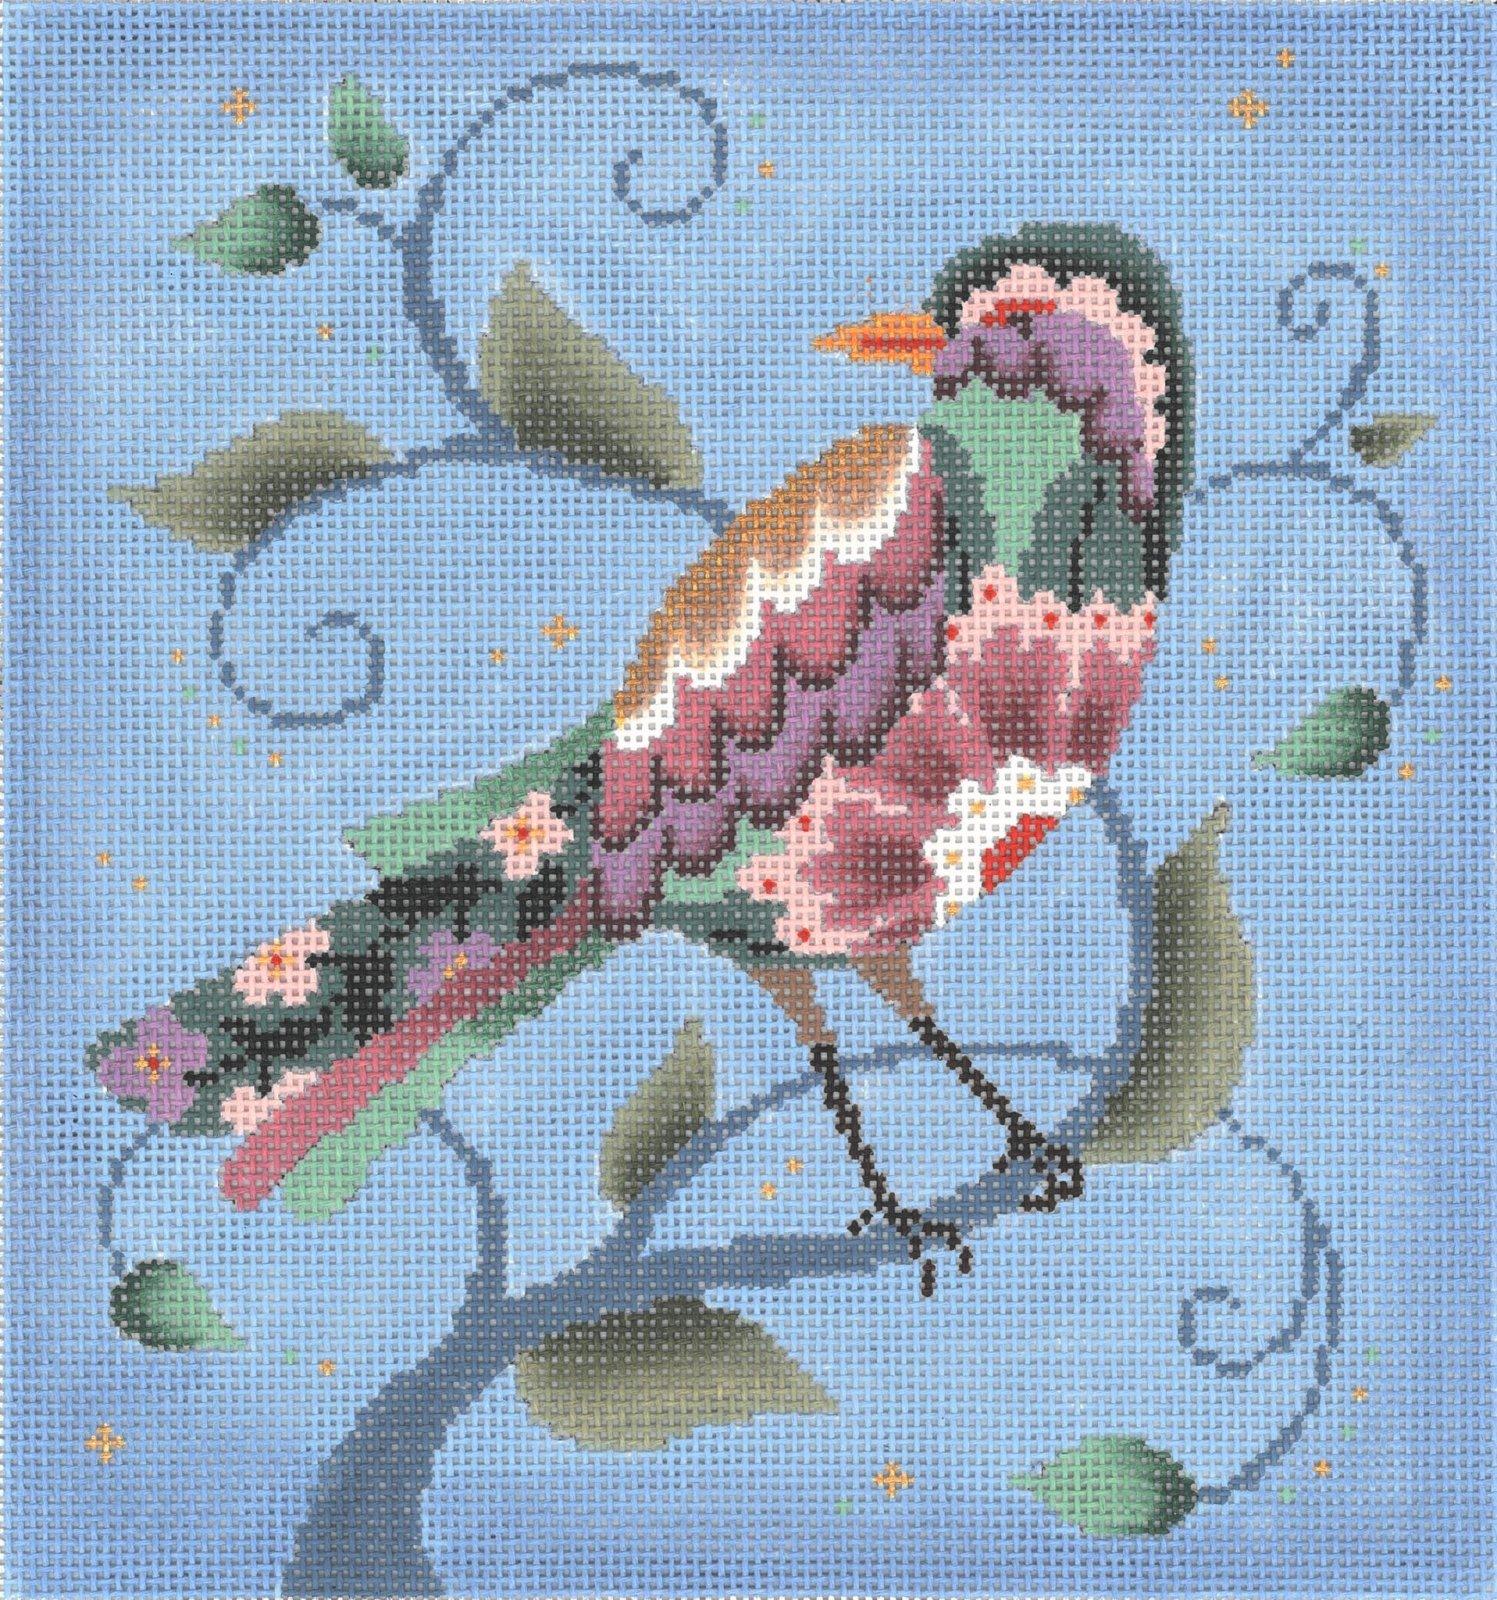 AC121 SONGBIRD by Abigail Cecile